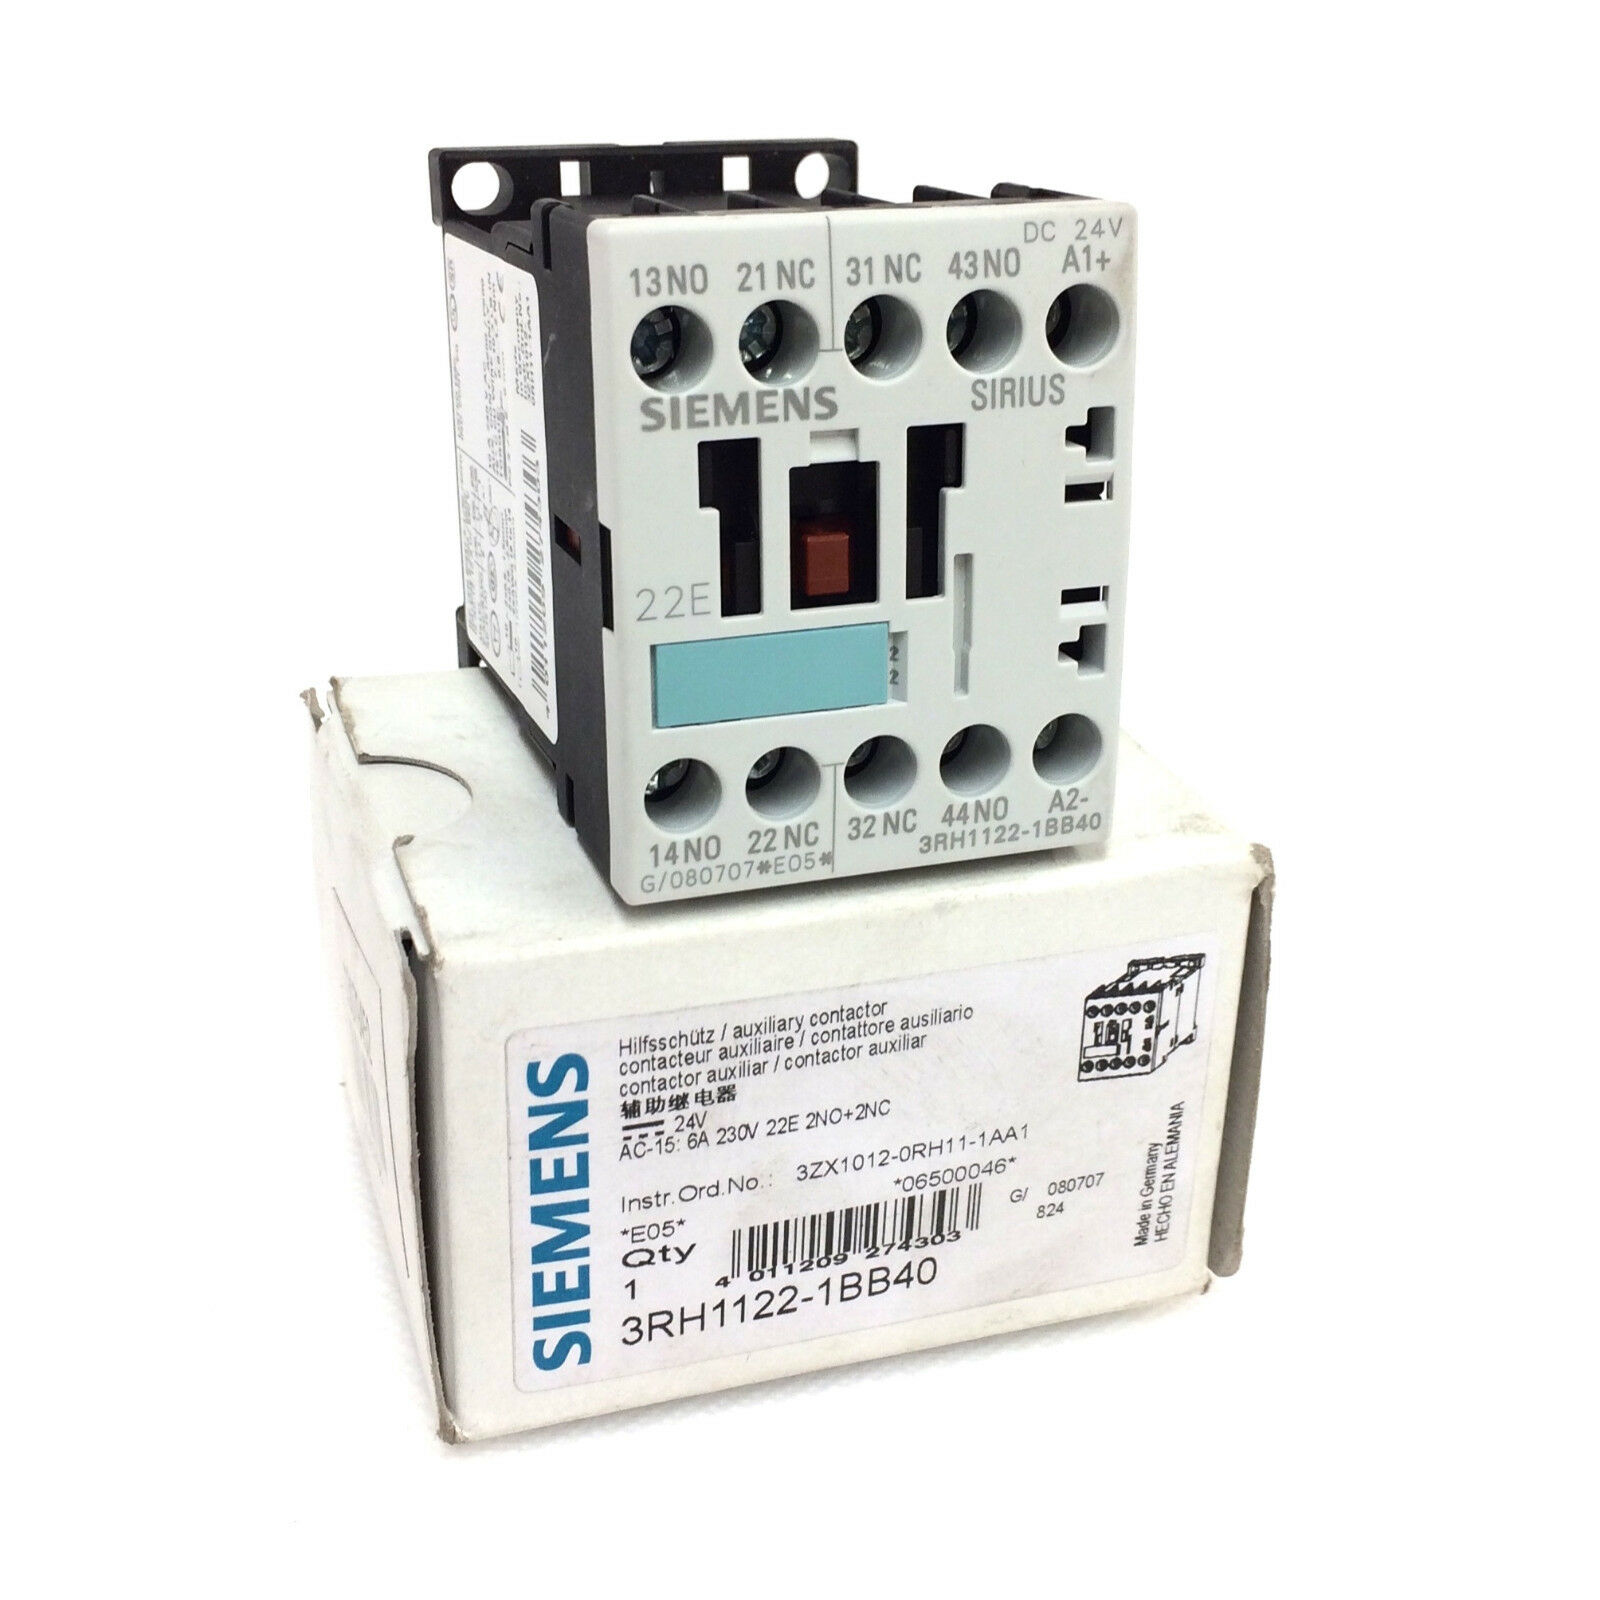 Auxilary Contactor 3RH1122-1BB40 Siemens 1.1kW 24VDC 3RH11221BB40